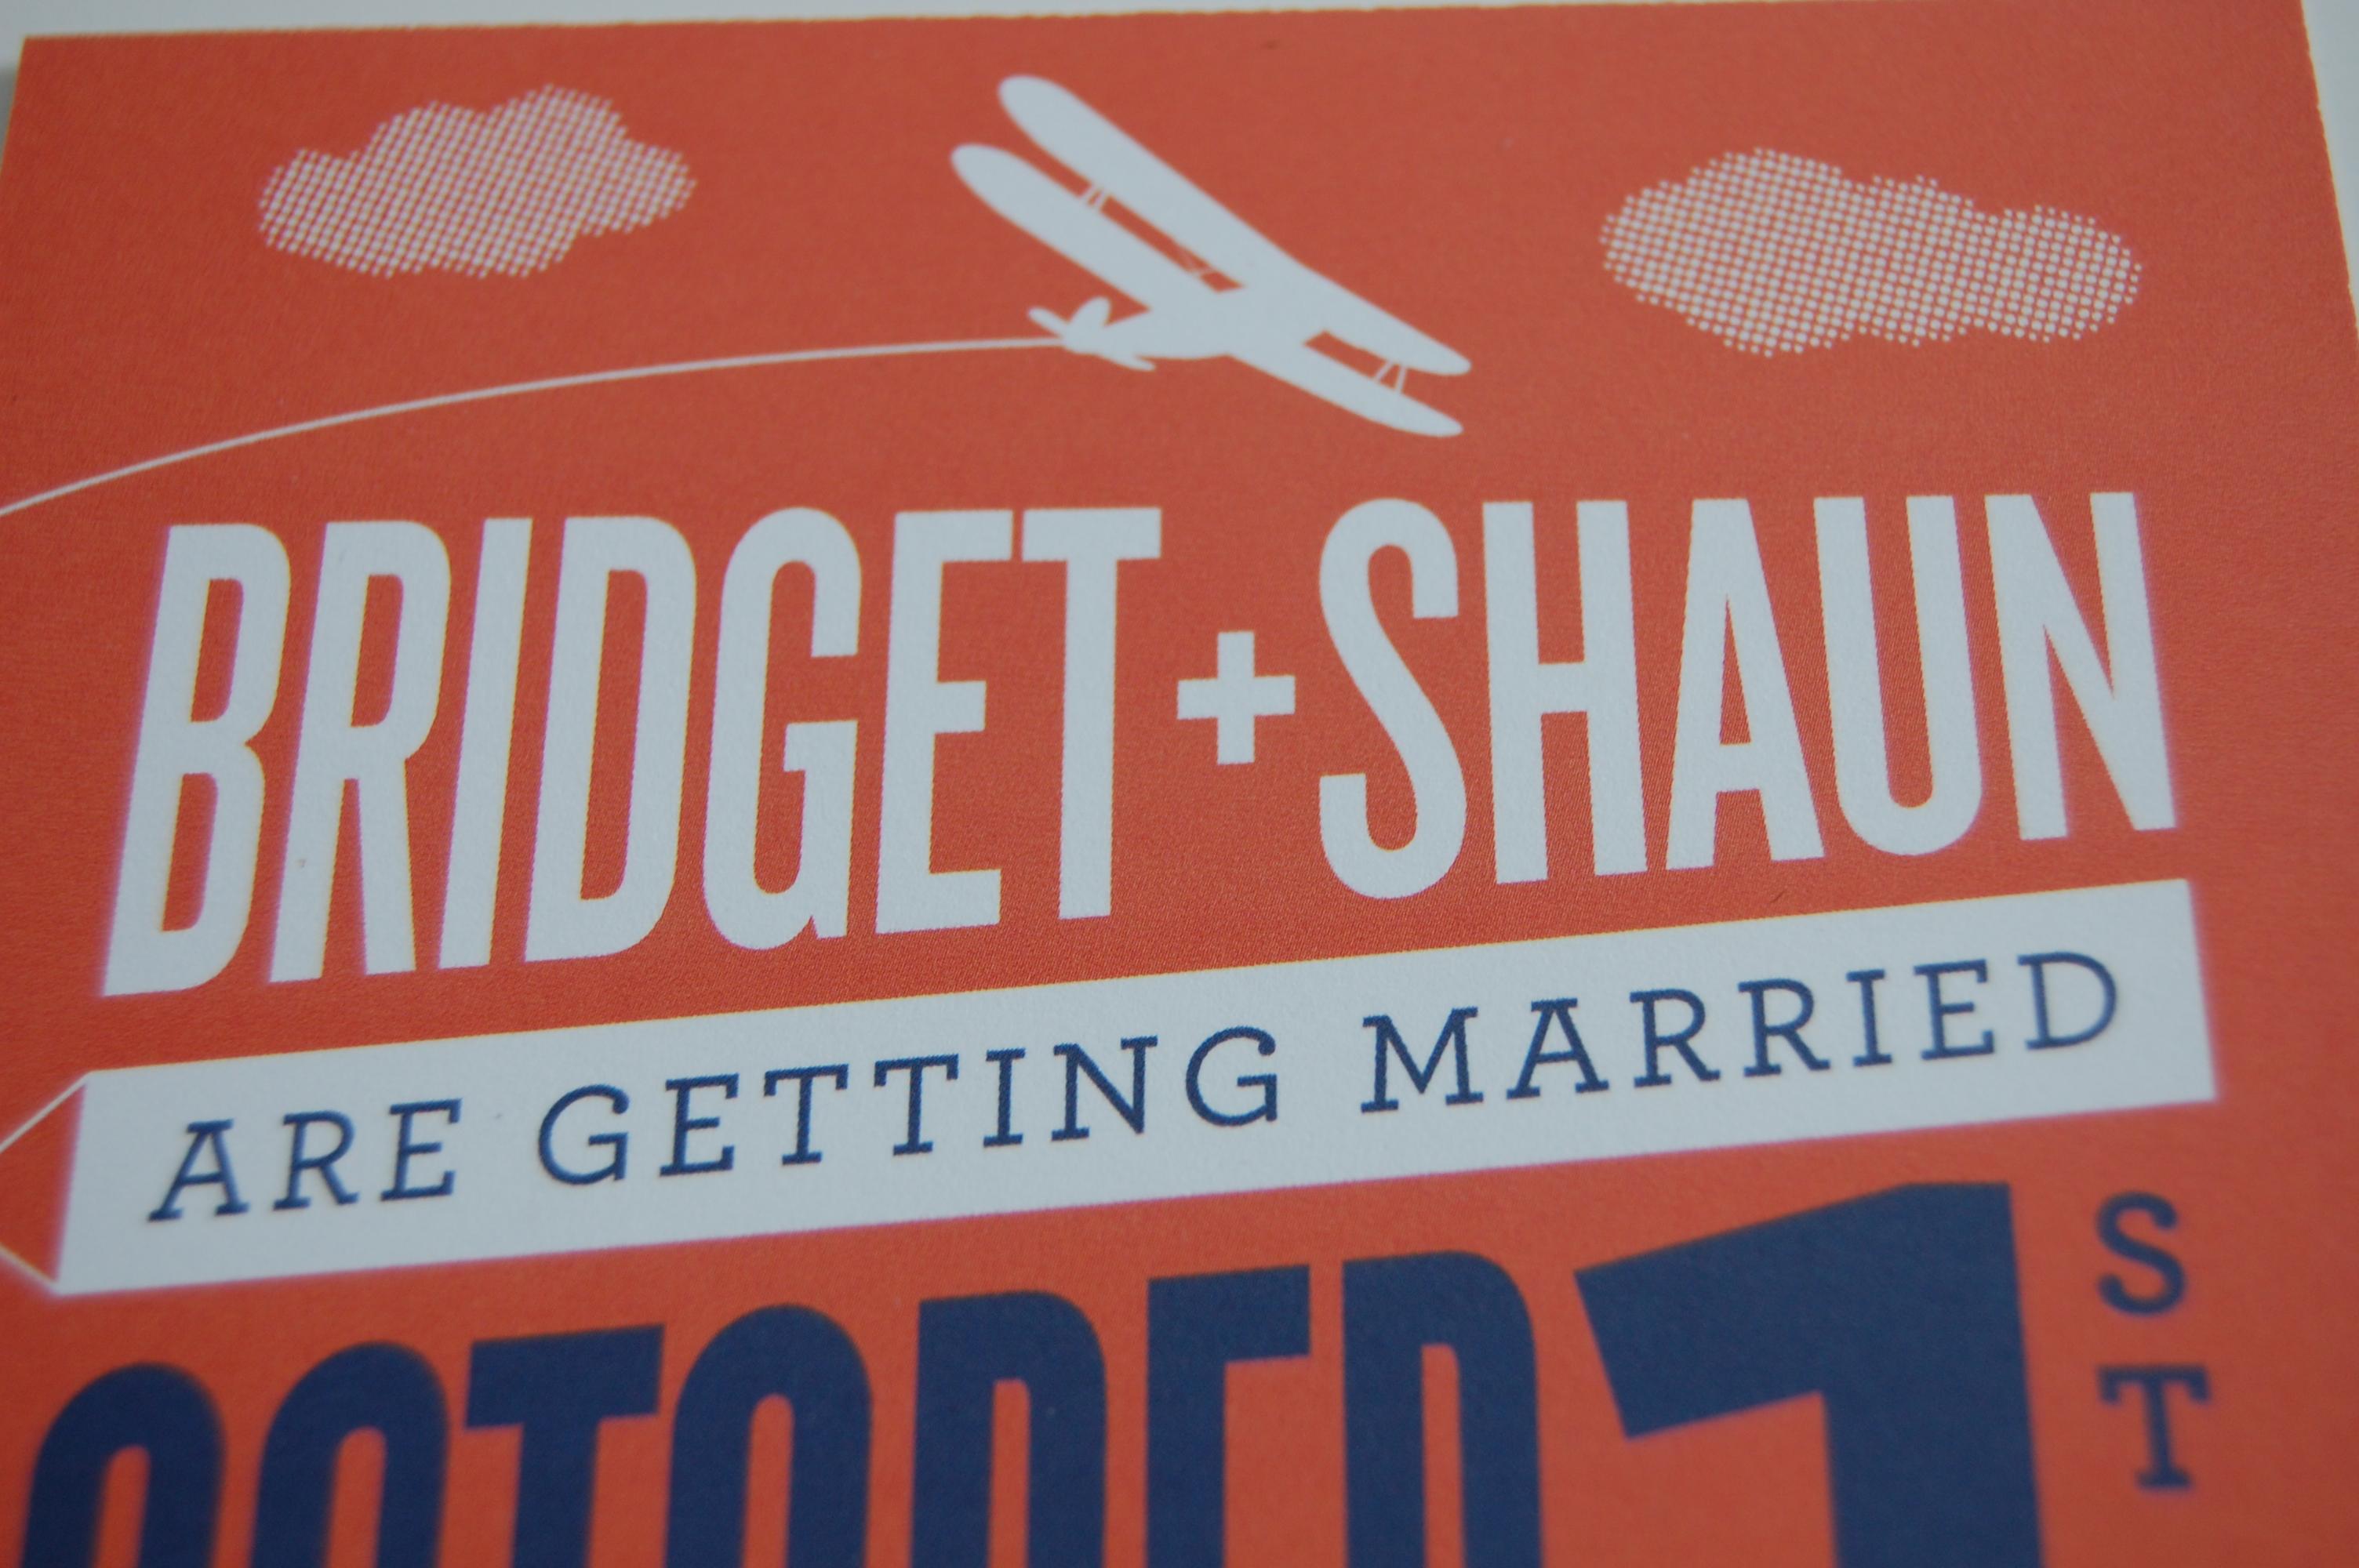 Bridget and Shaun Wedding Invitations